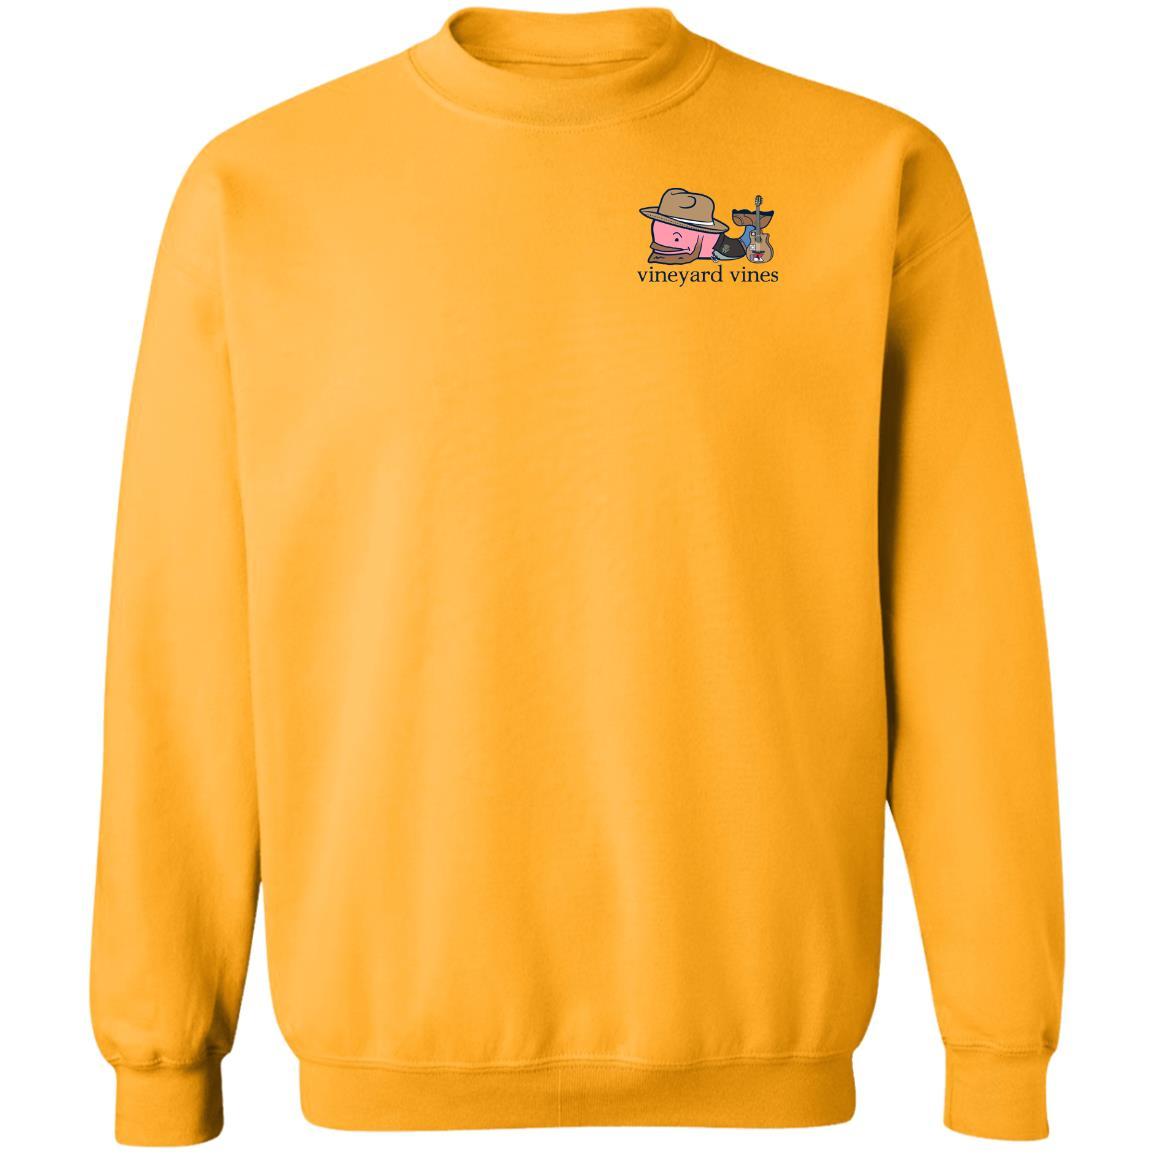 Zac Brown Whale Vineyard Vines Shirt Vineyardvines Merch Zac Brown Whale Vineyard Vines Shirt Hoodie Sweatshirt